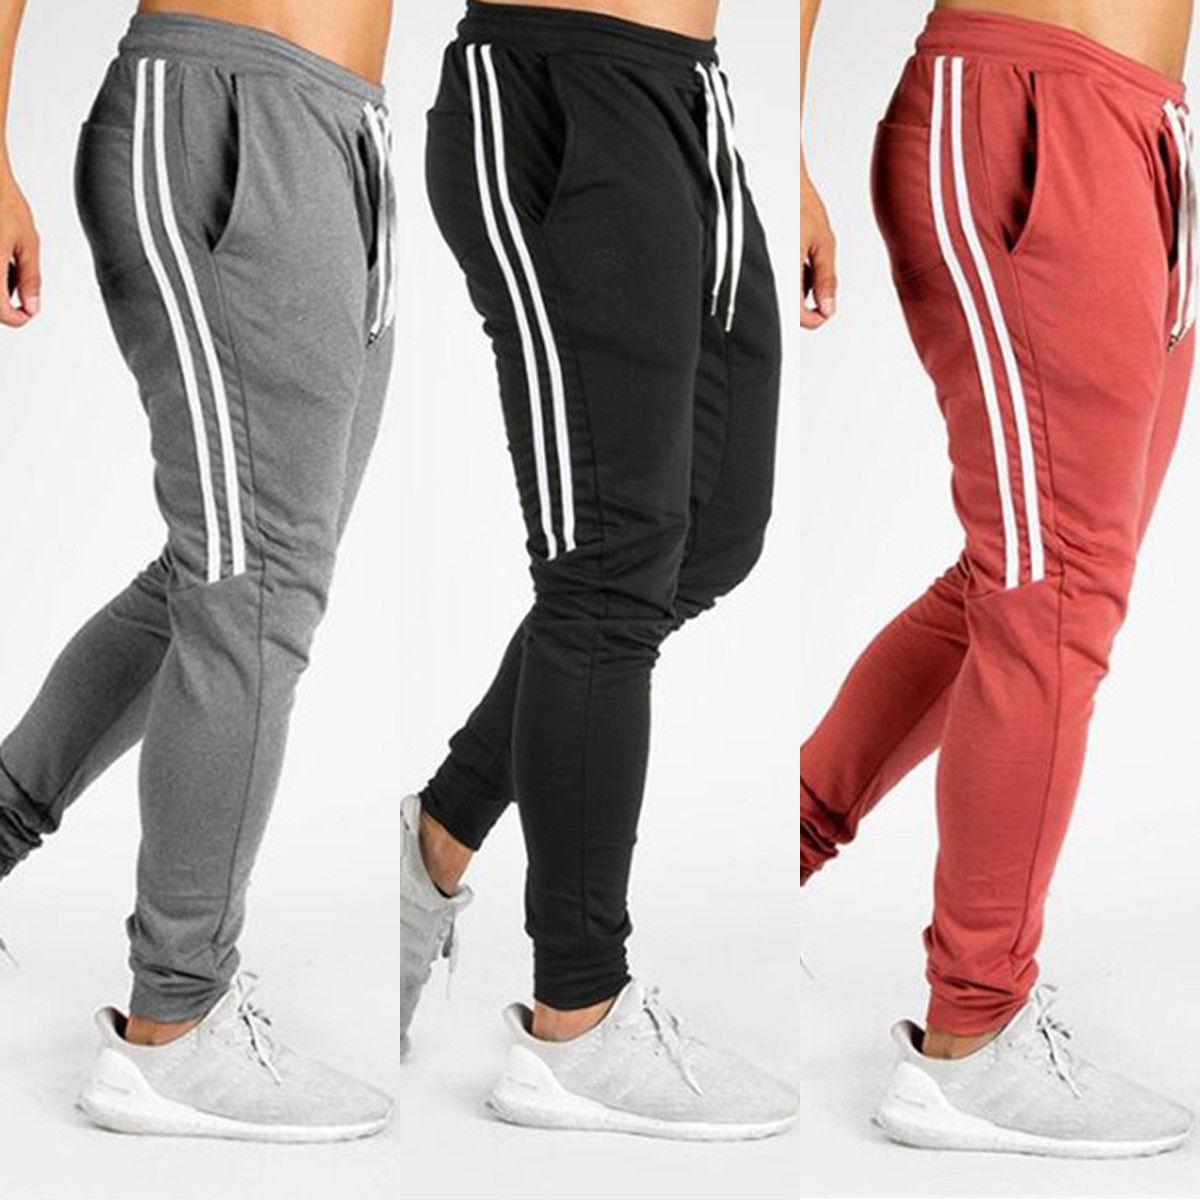 Mens Long Casual  Pants Slim Fit Trousers Jogge Sweatpants Good Quality Men's Casual Pants